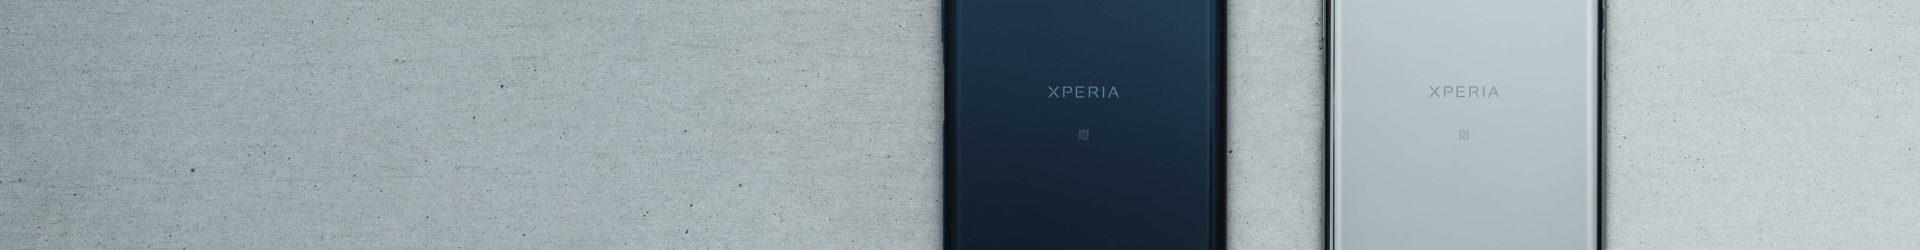 Sony Xperia XZ Premium: design Sony, display 4K, fotocamera top e Snapdragon 835